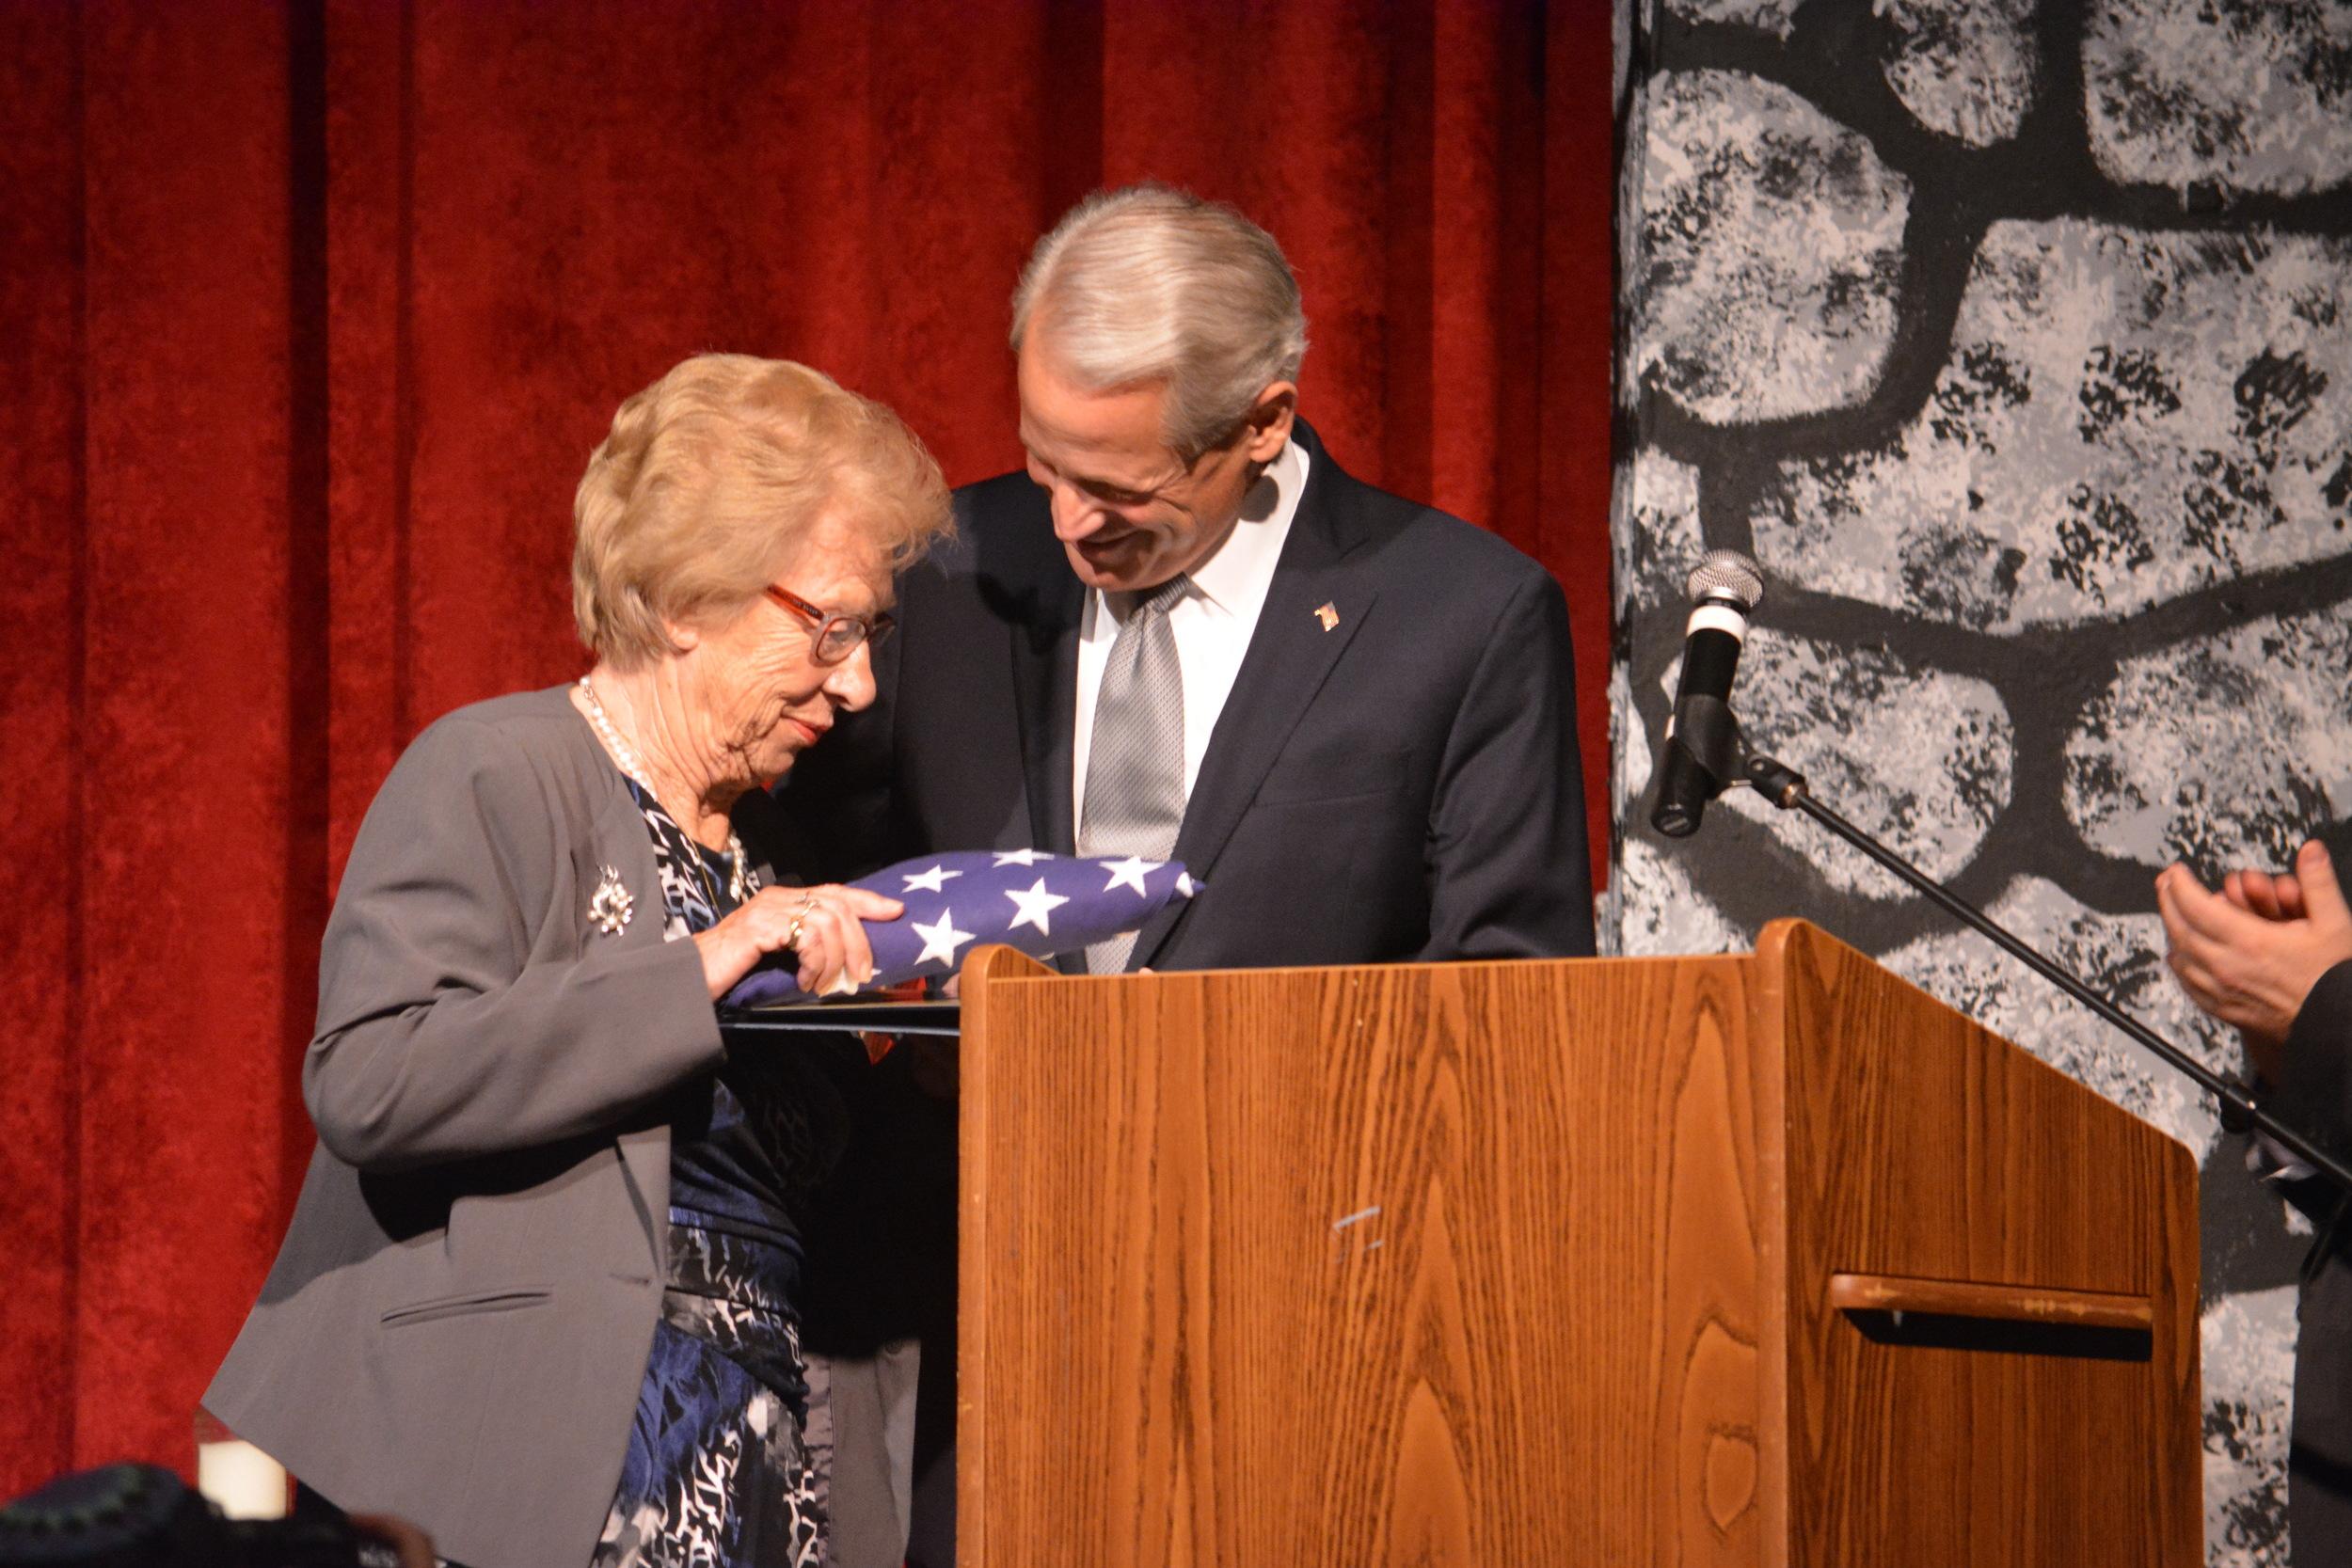 Congressman Steve Israel presents Holocaust survivor Eva Schloss with an American flag in Commack last week. (Long Islander News photo/Arielle Dollinger)